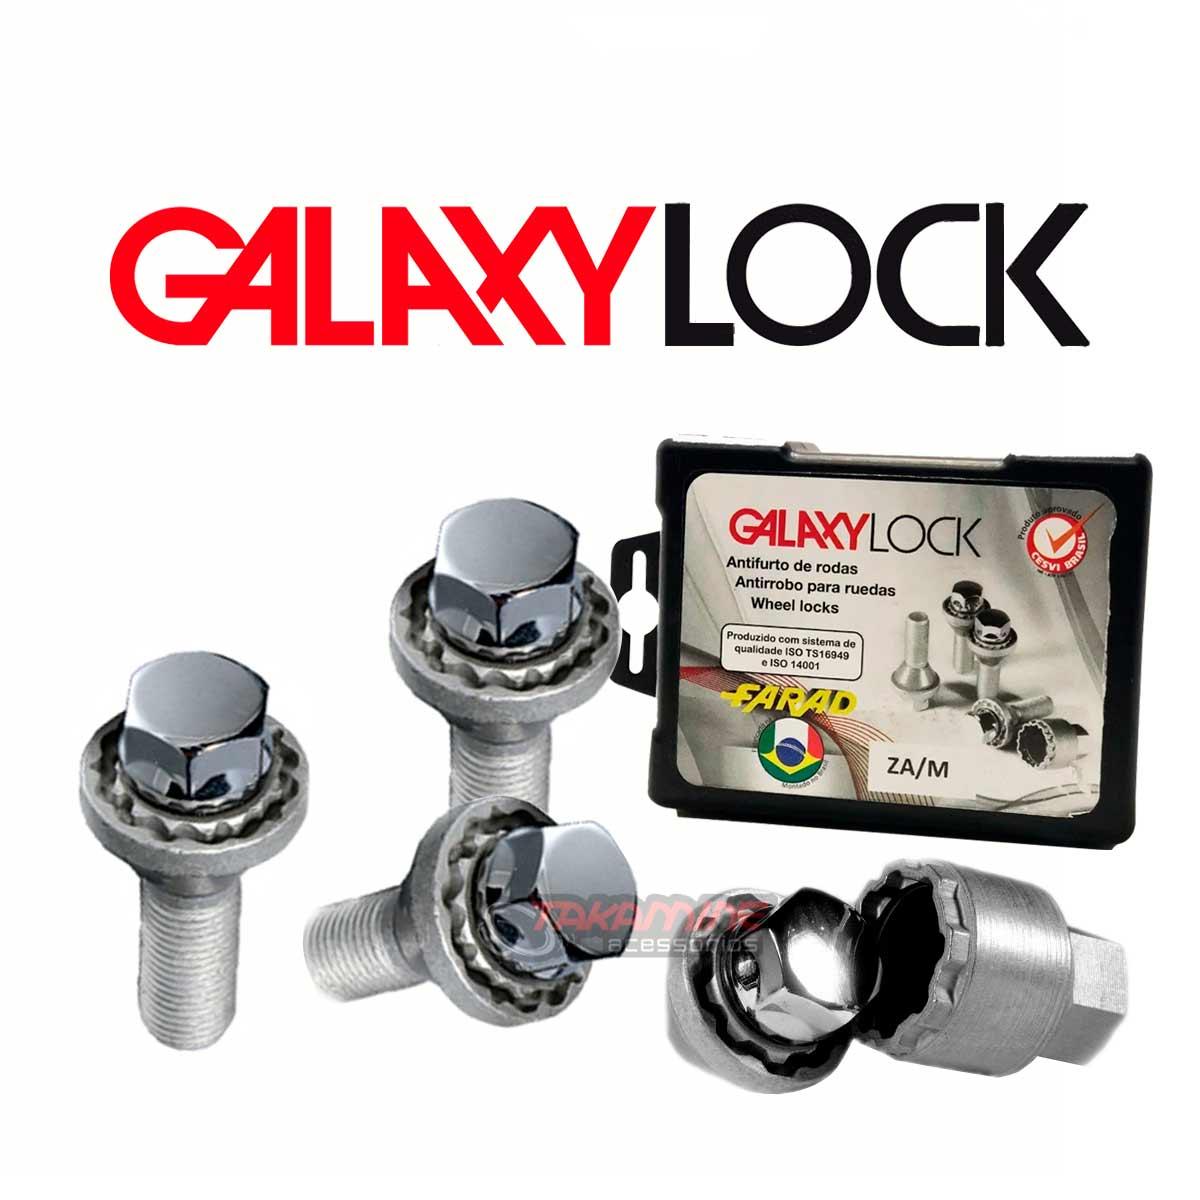 Parafuso antifurto para rodas Galaxy Lock Saveiro 1982 até 2020 (roda de liga) L2/M